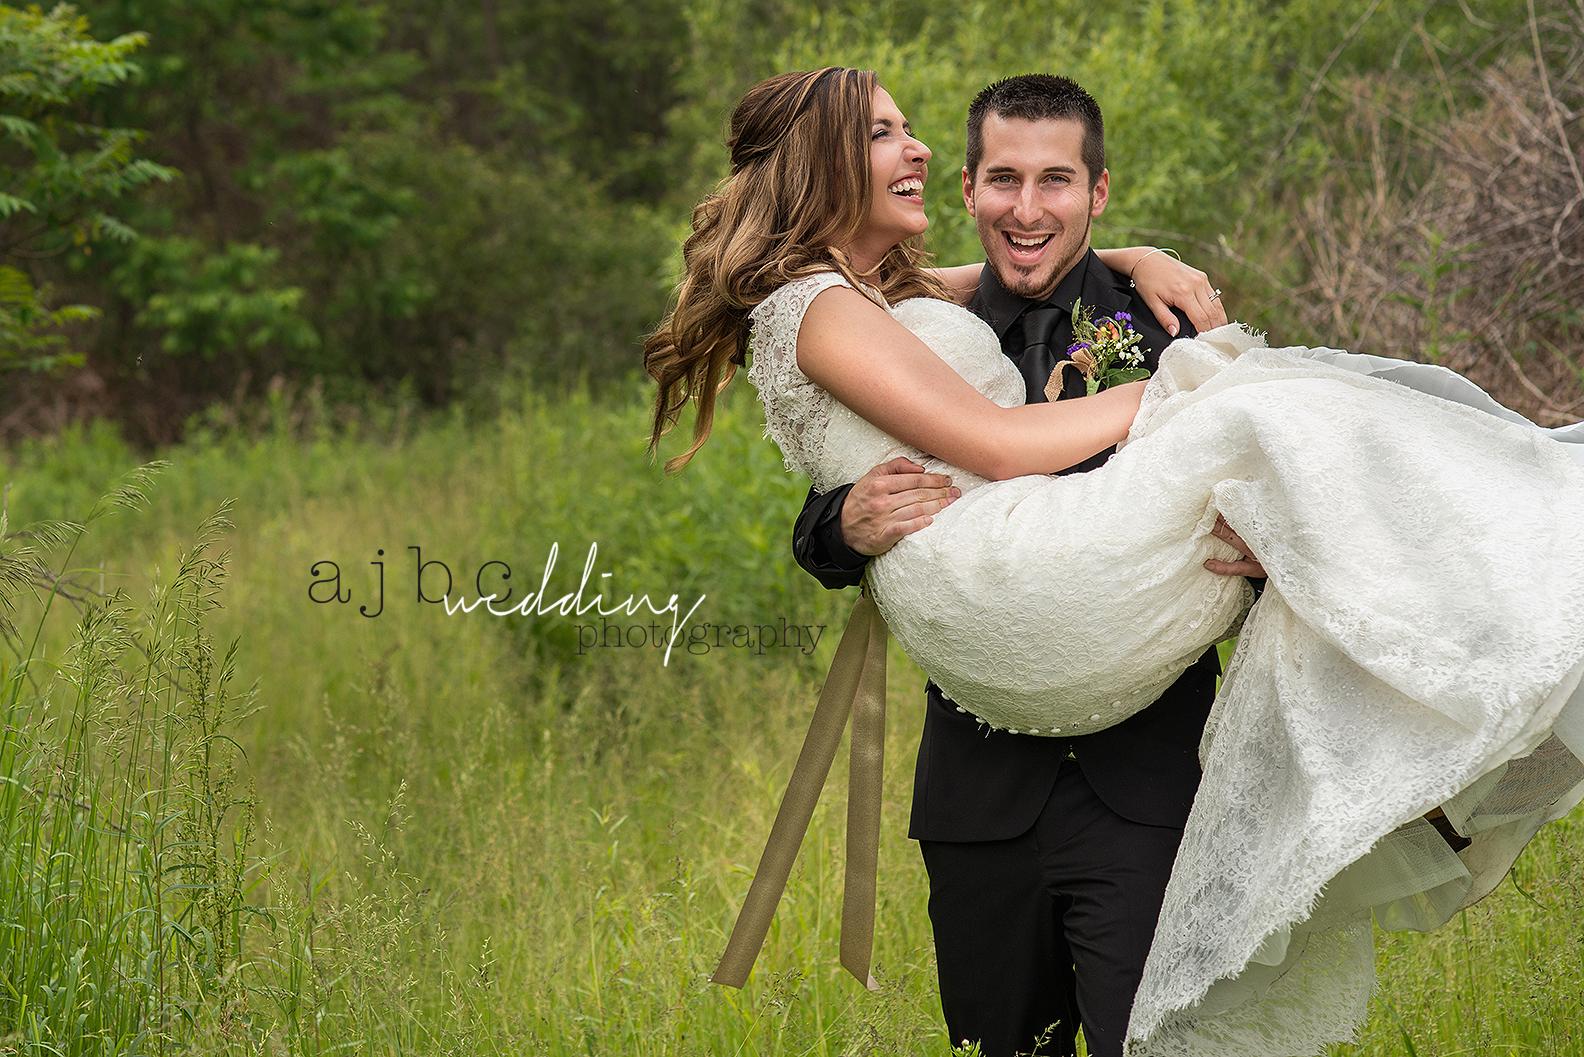 ajbcphotography-port-huron-michigan-wedding-photographer-outdoors-summer-wedding-country-wedding-wadhams-michigan-bride-vintage-wedding-outdoor-wedding-photographer-love.jpg